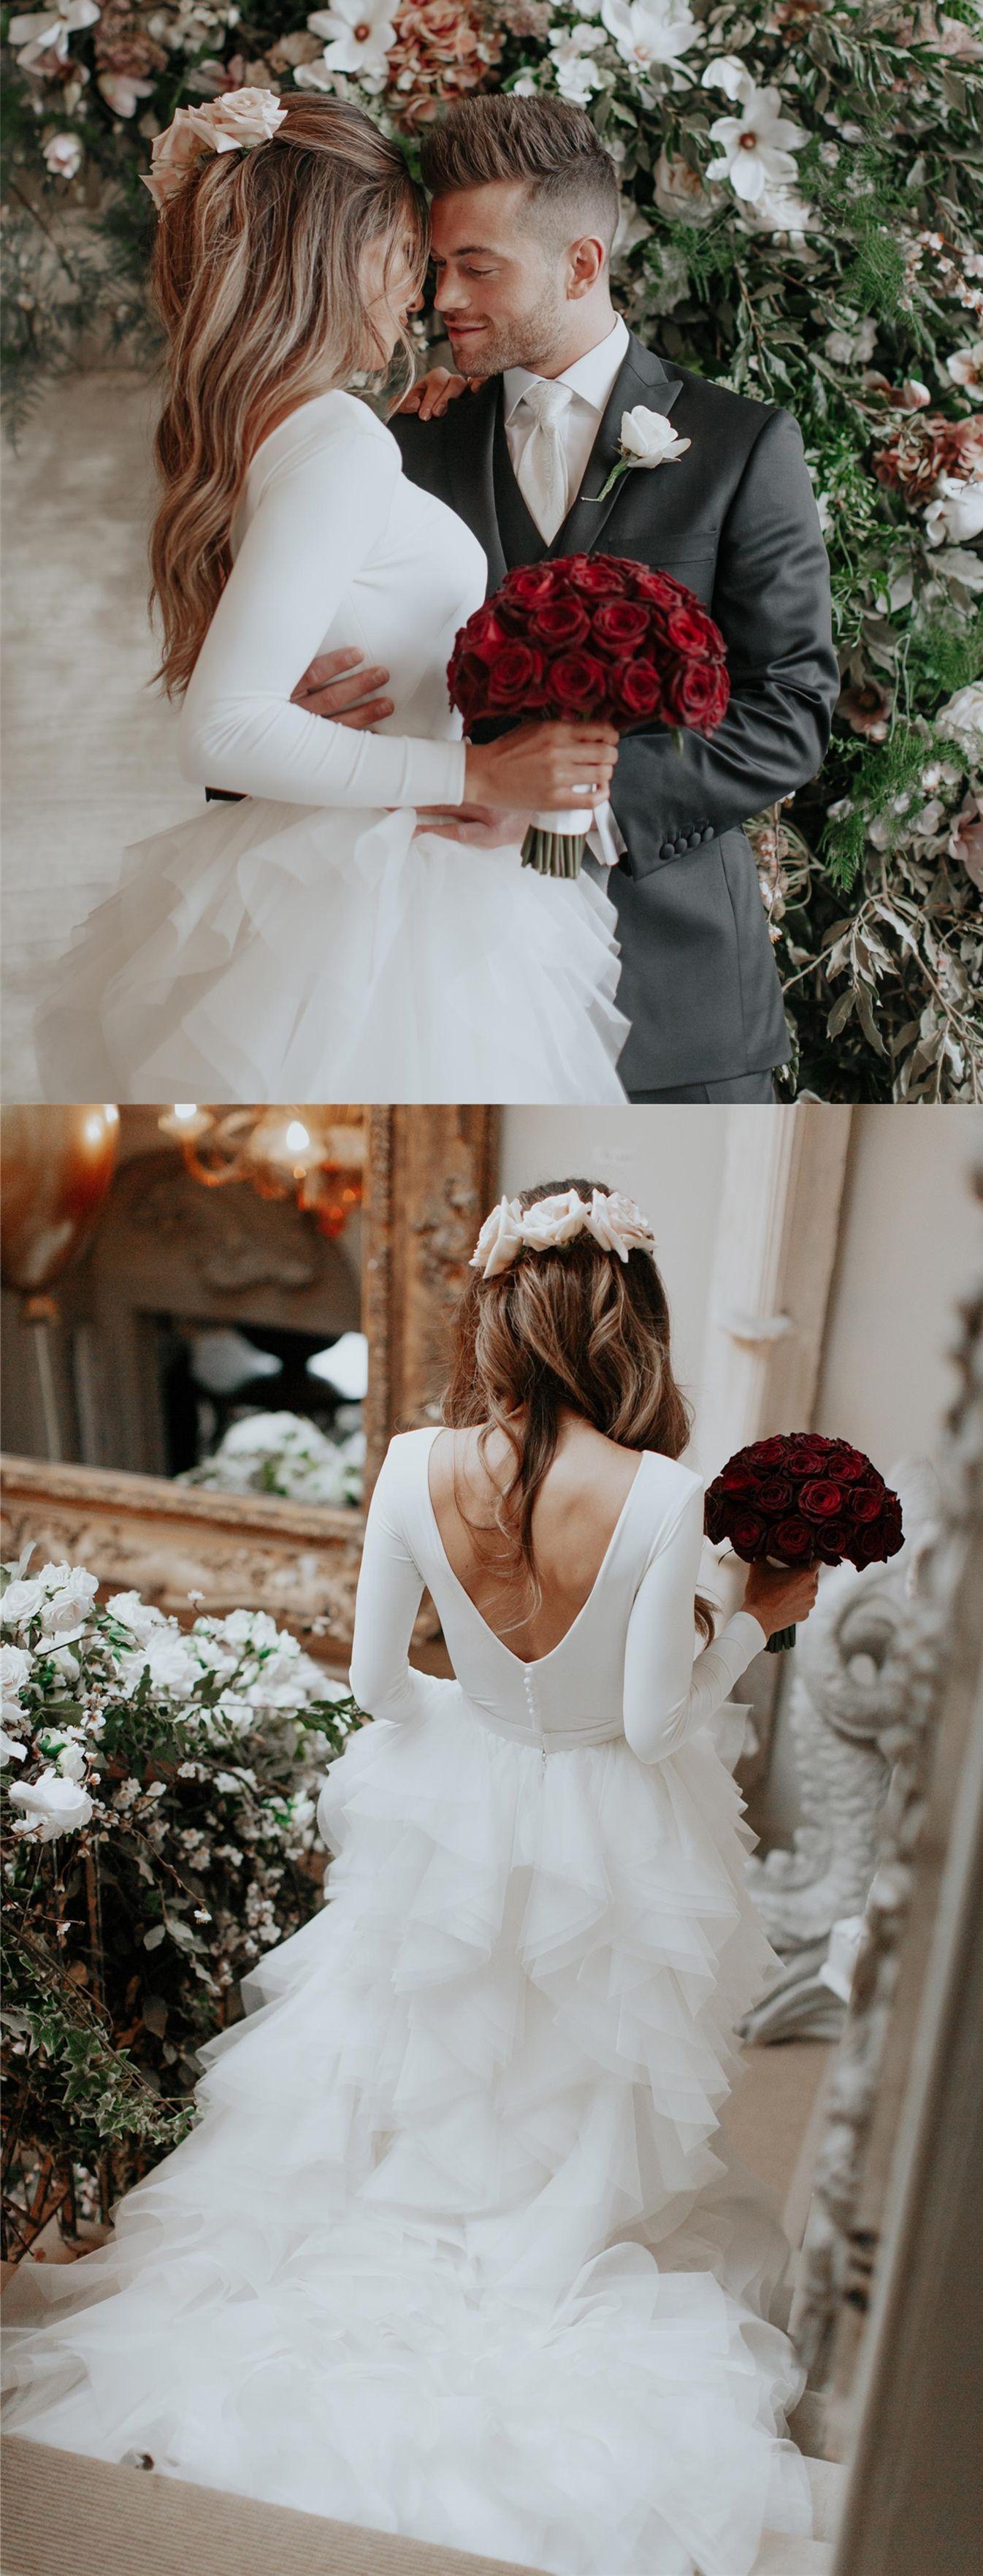 Aline bateau long sleeves sweep train tiered tulle wedding dress in